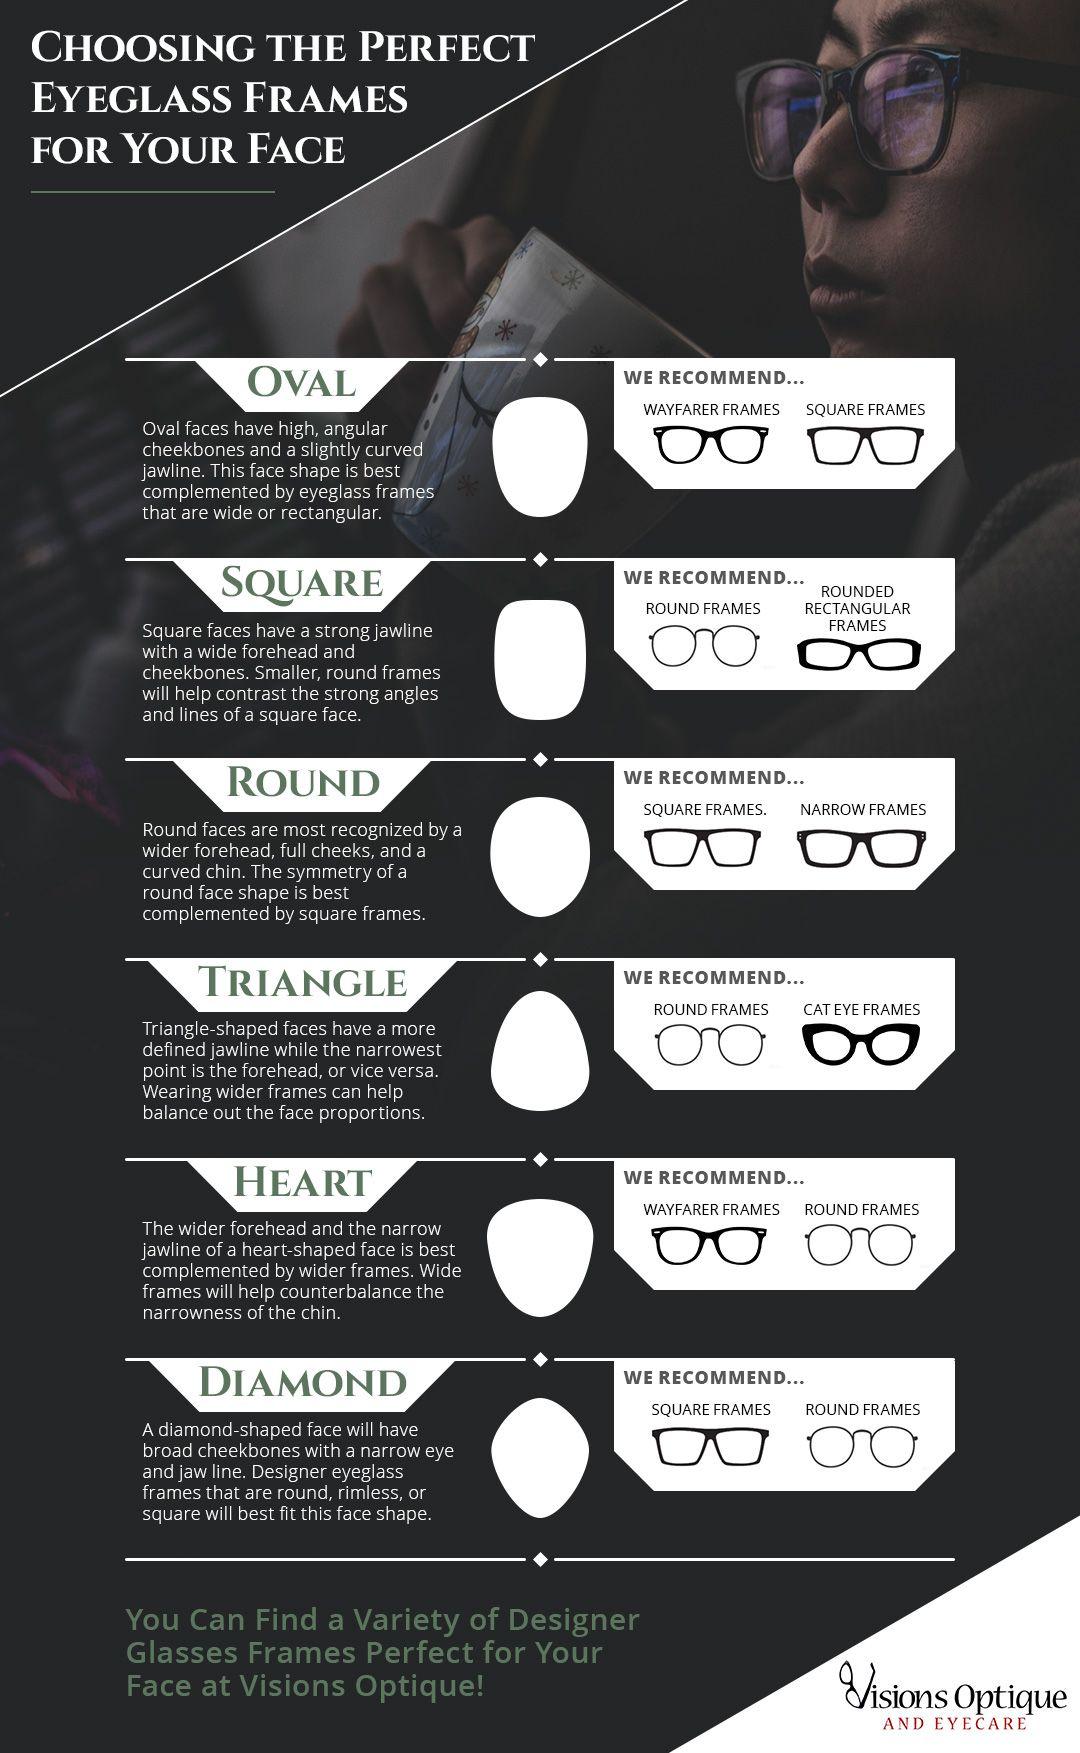 Choosing perfect eyeglasses for face